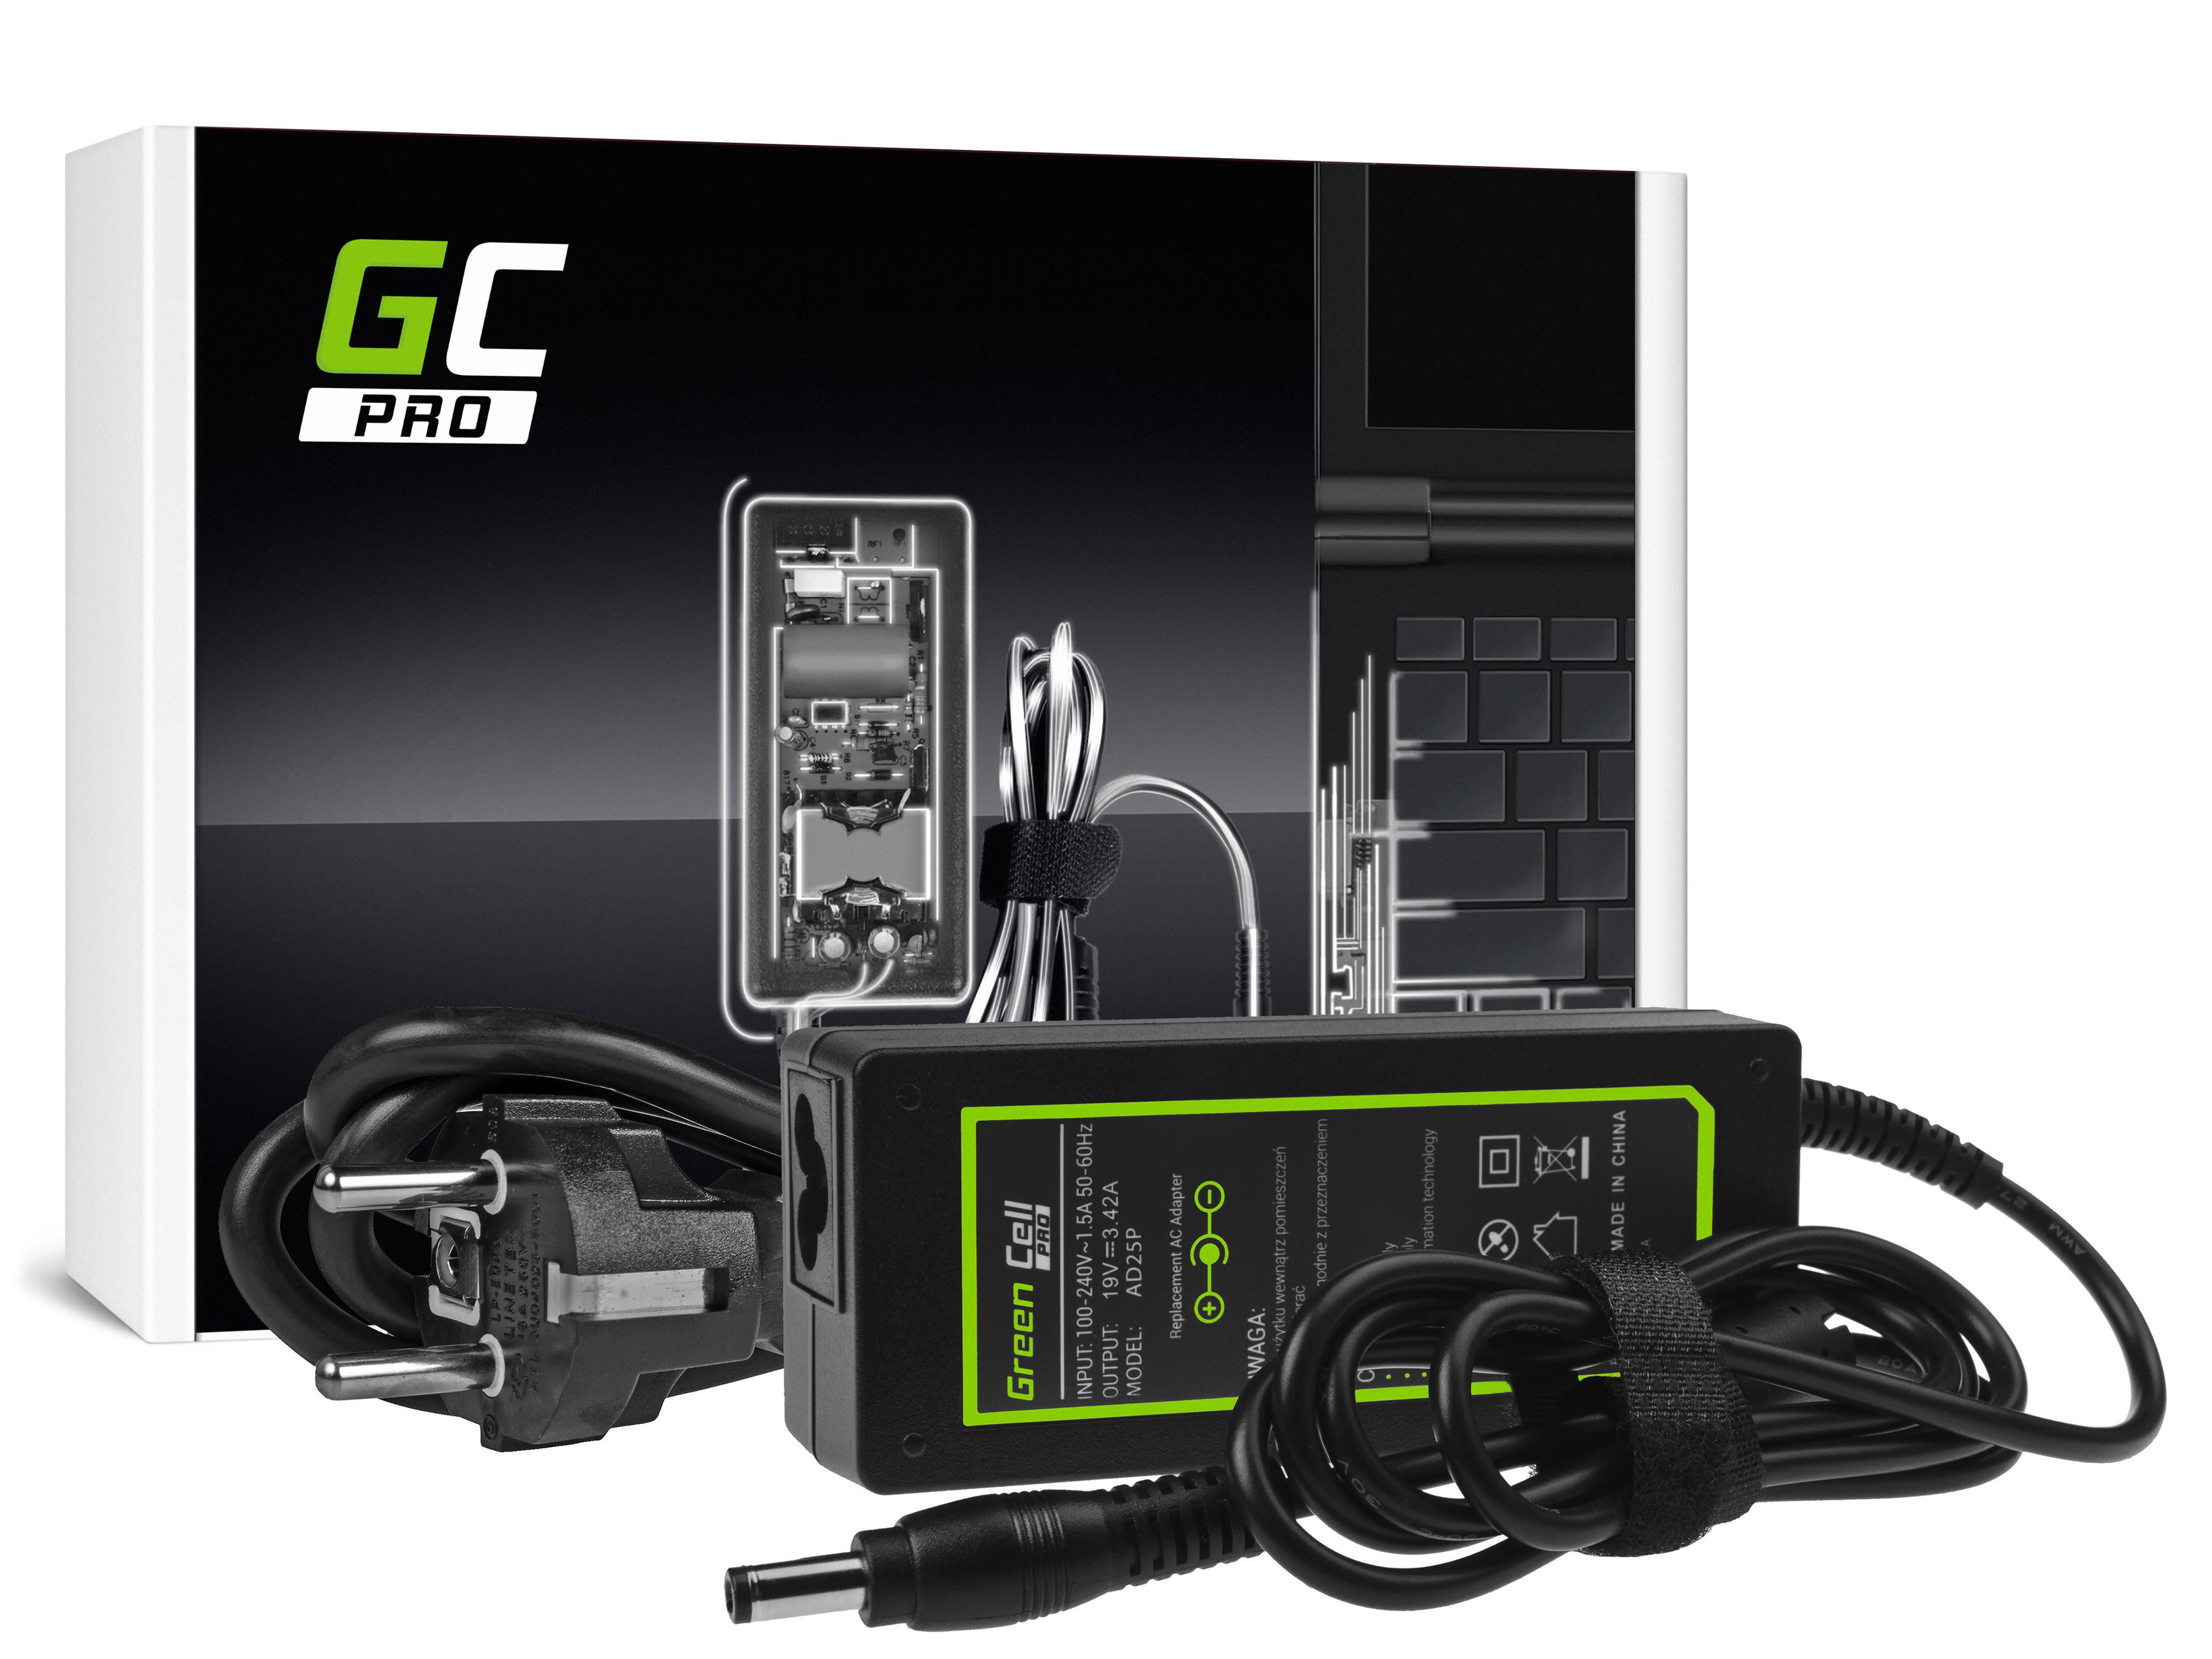 Green Cell AD25P Nabíječka Adaptér pro Toshiba Satellite C650 C660D L750 Asus X550C X550V R510 Lenovo G530 19V 3.42A 65W